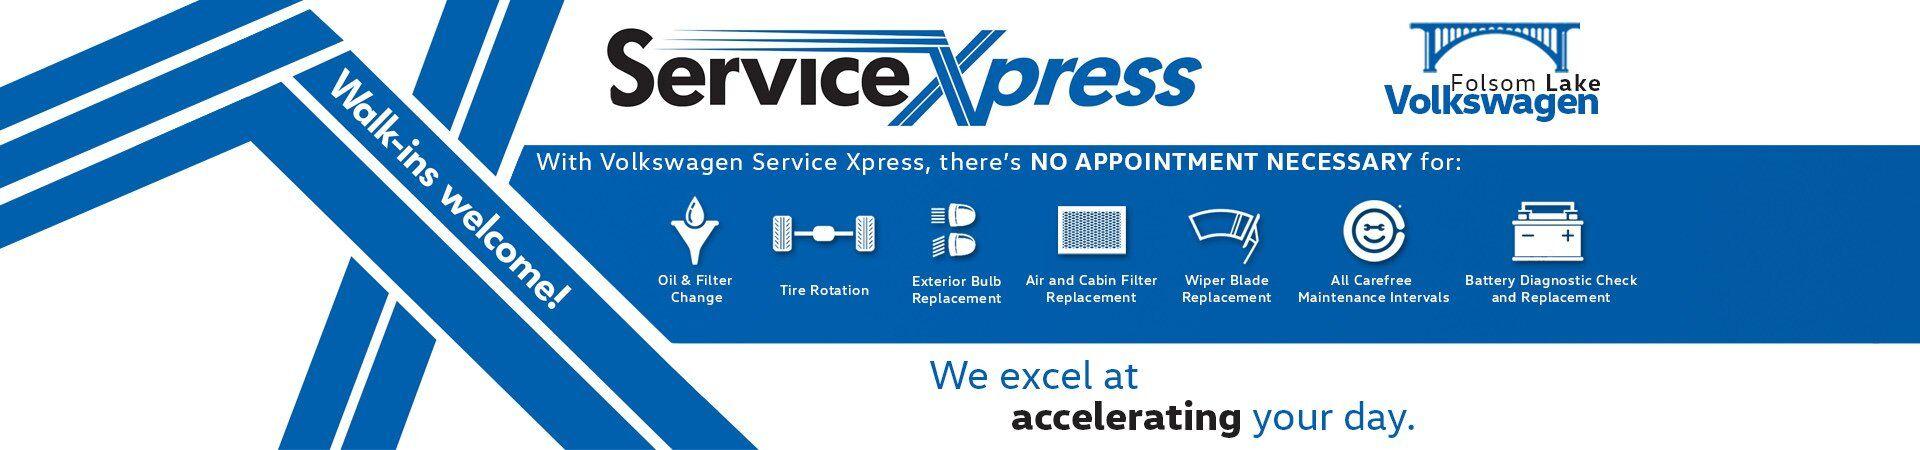 it volkswagen service june we specials wefixit repair tempe fix scottsdale off coupons print percent auto